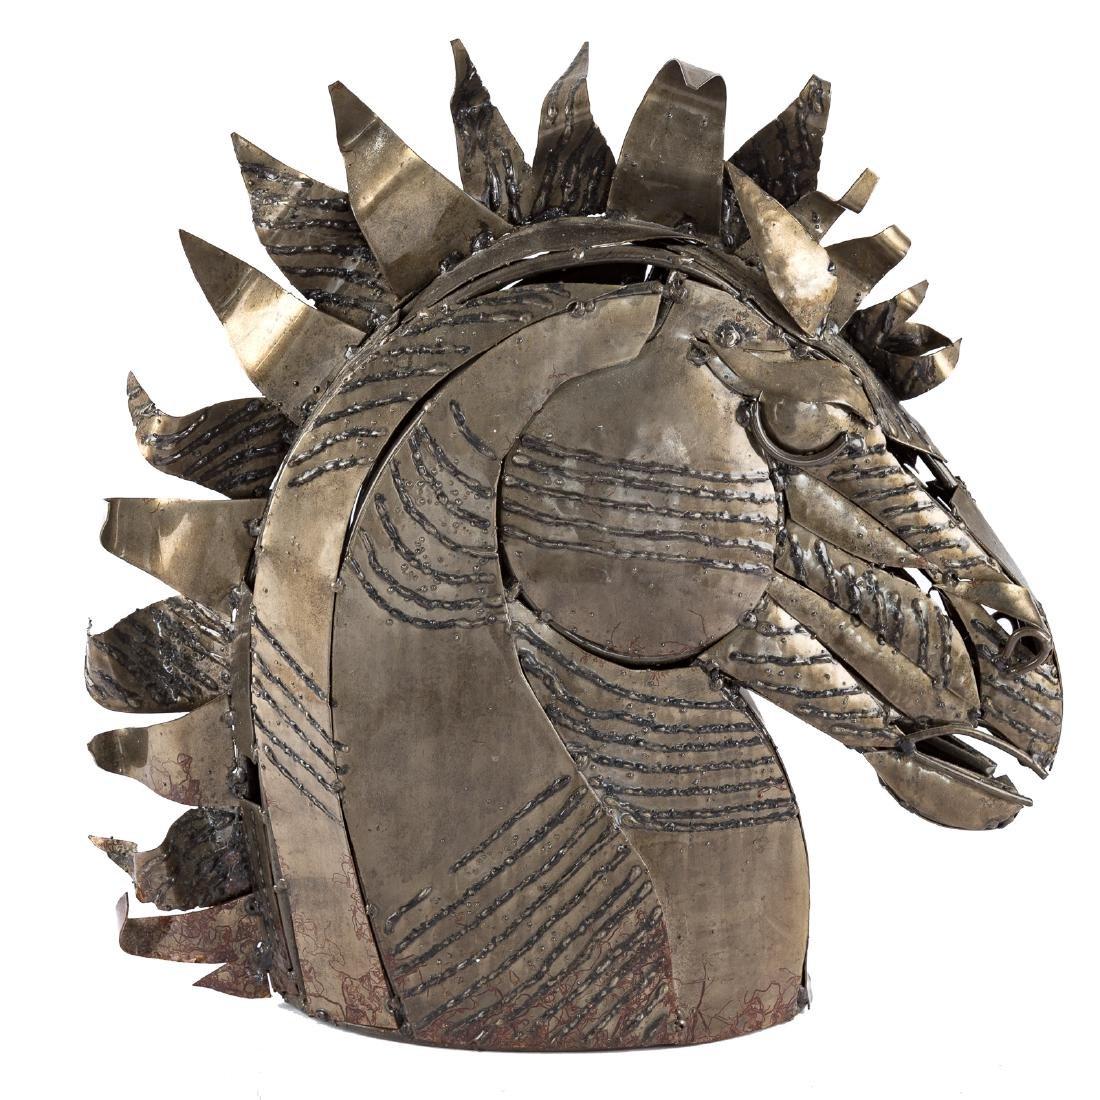 Contemporary School. Bust of Horse, sculpture